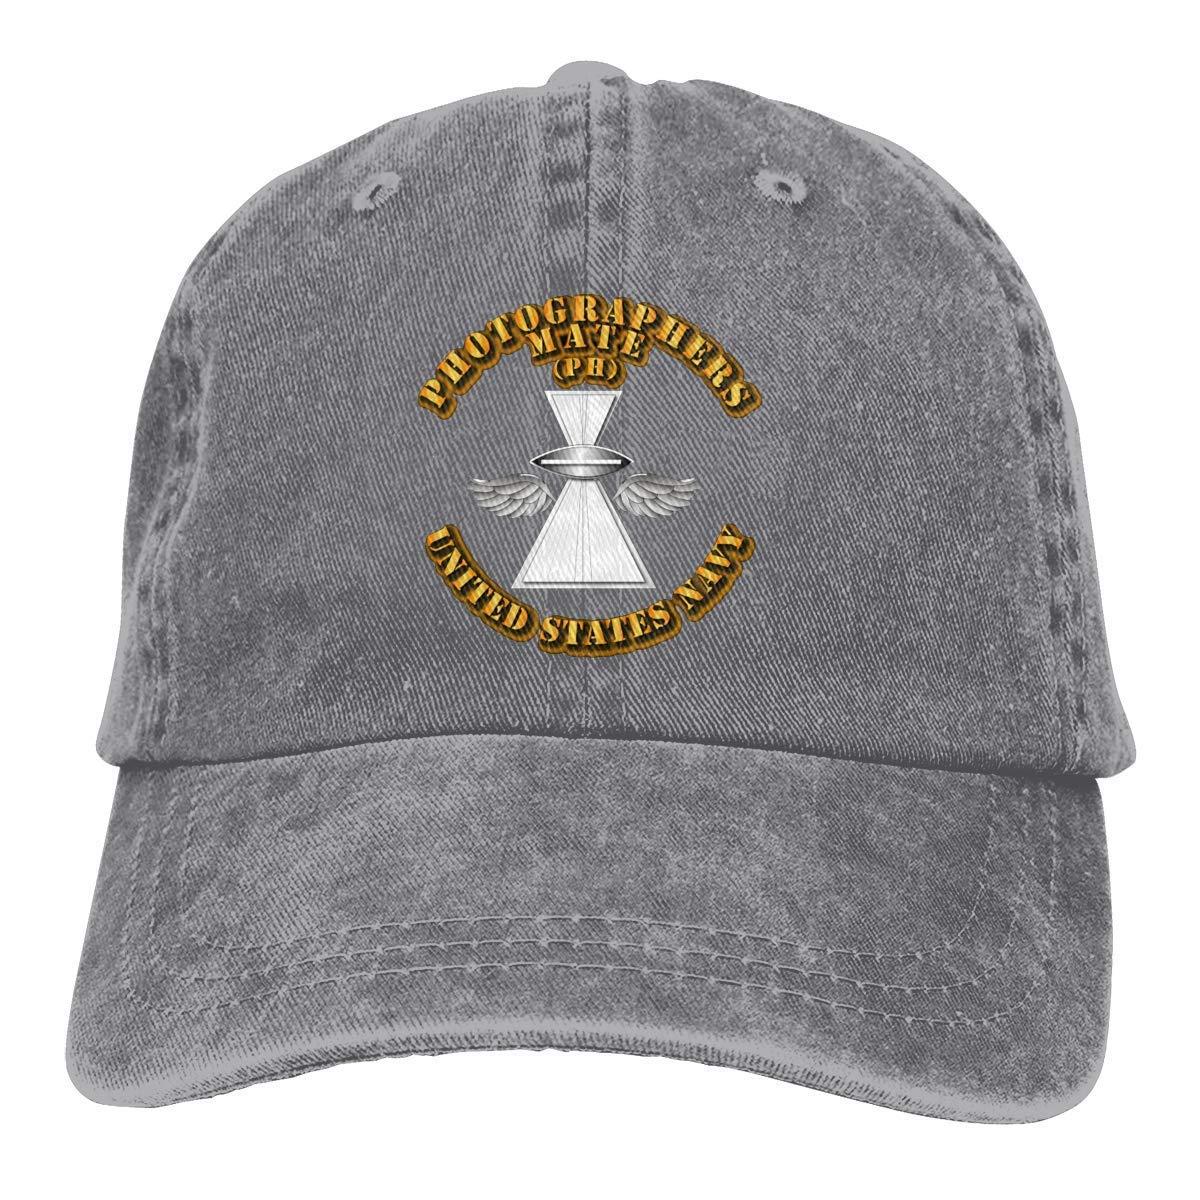 Rate Lilyo-ltd Navy Photographers Mate Vintage Baseball Cap Trucker Hat for Men and Women